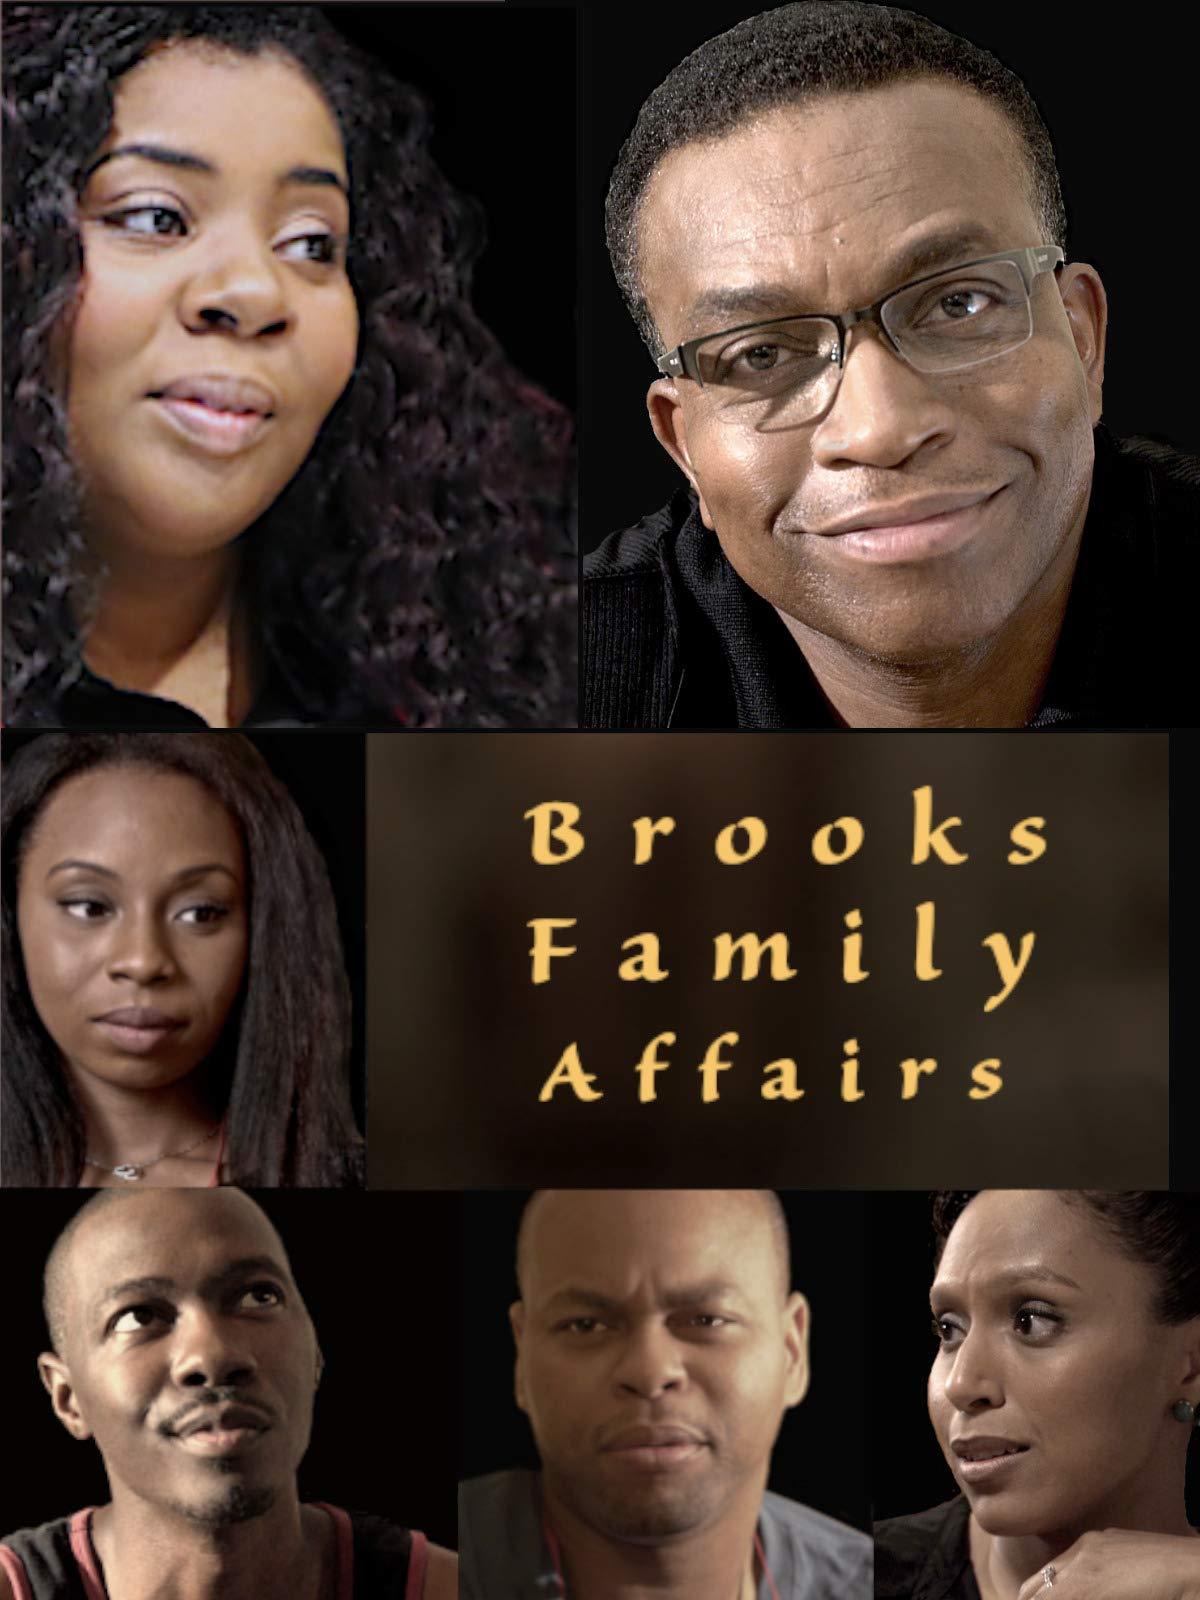 Brooks Family Affairs